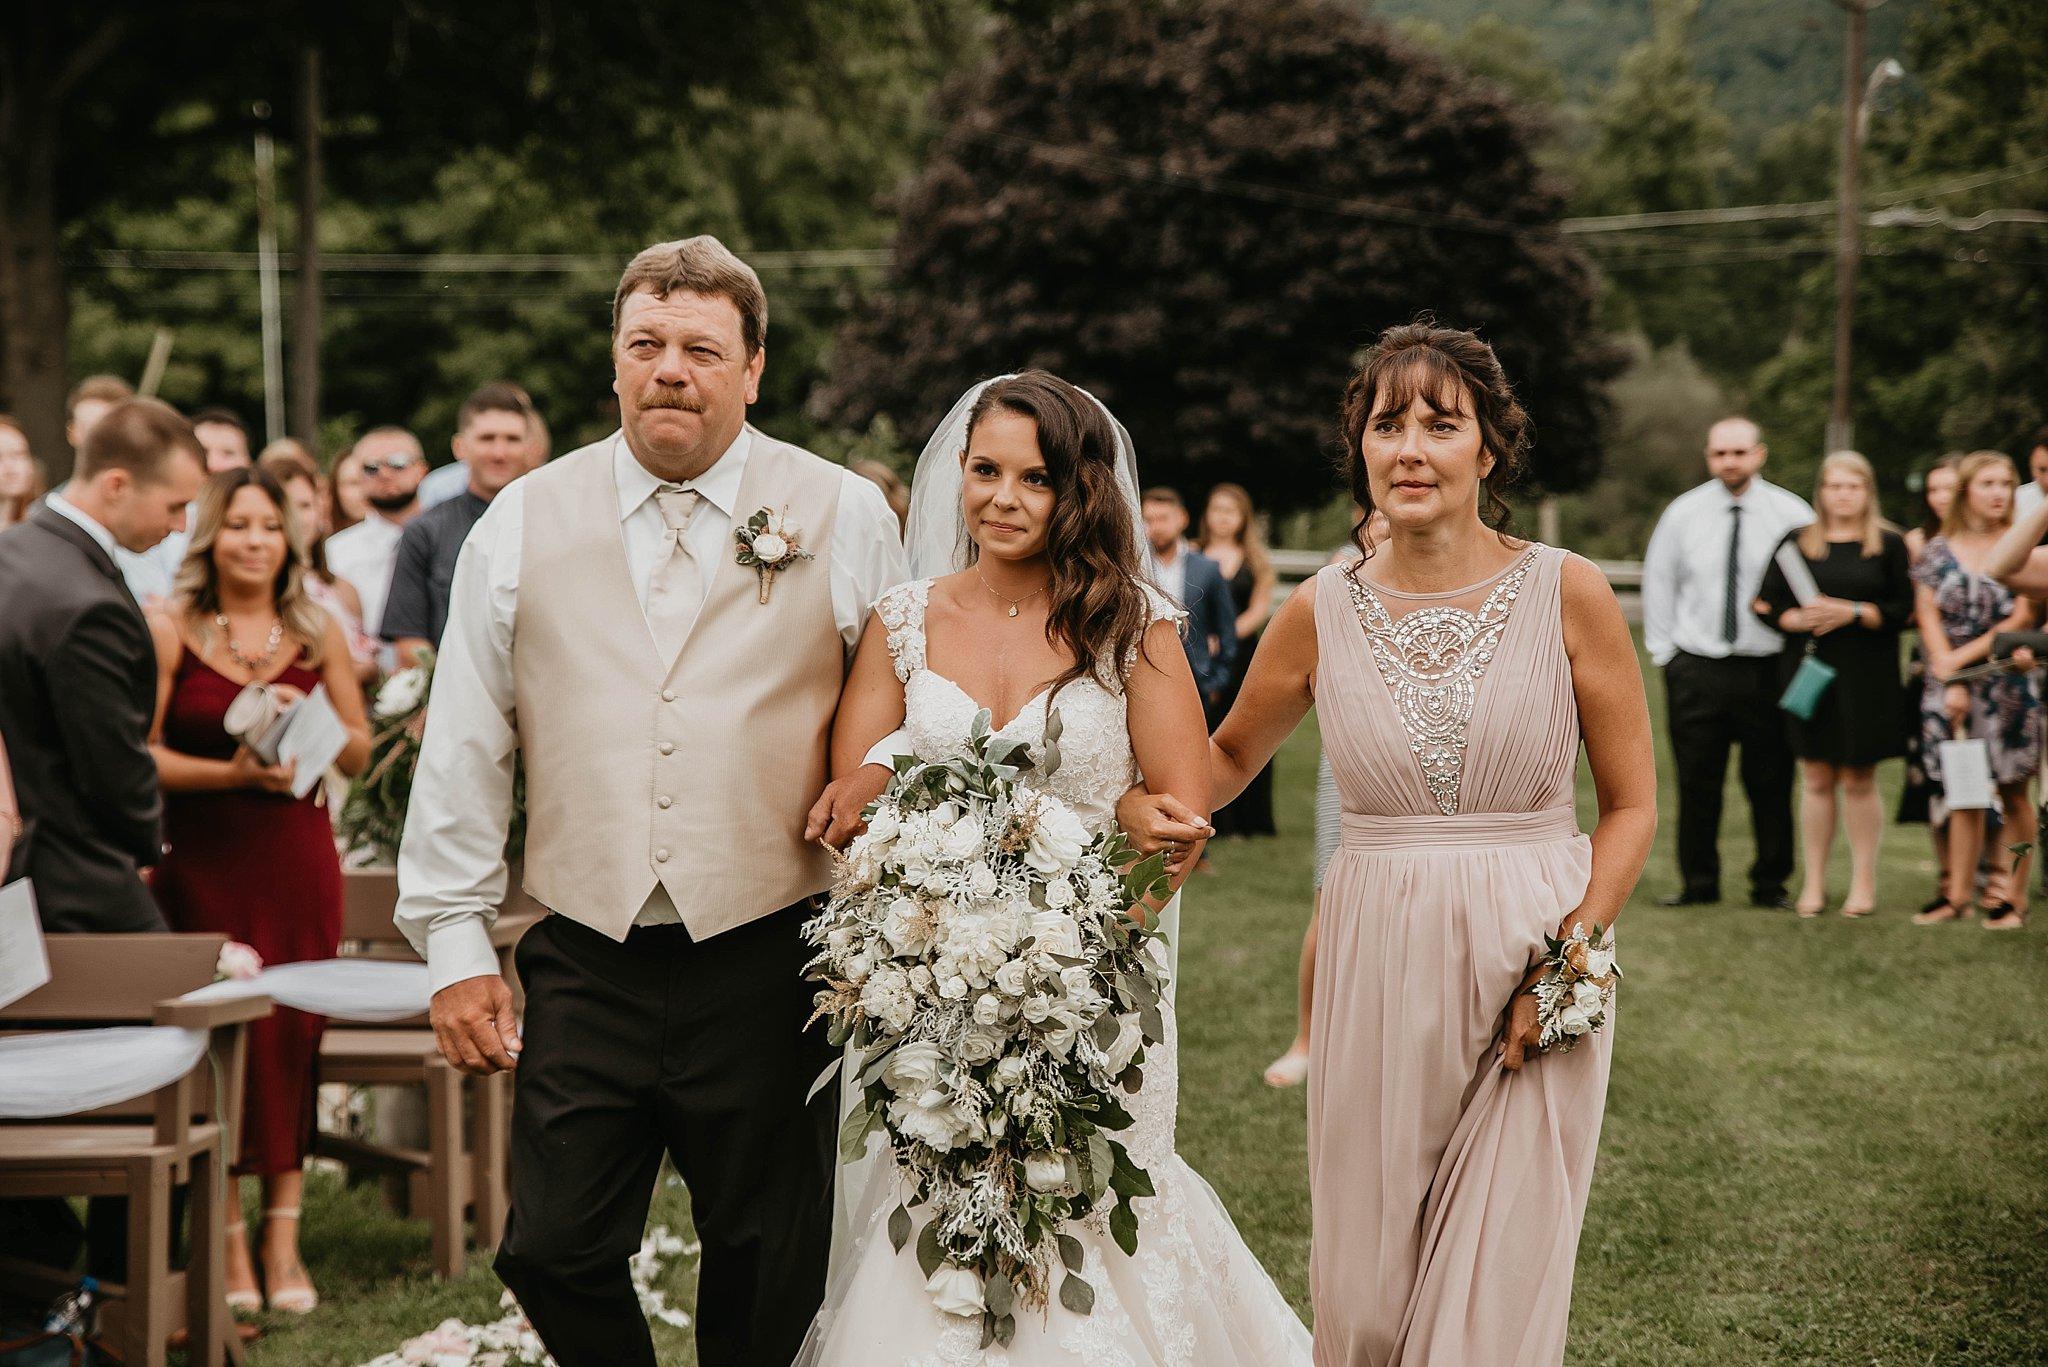 New-York-wedding-photographer_0090.jpg